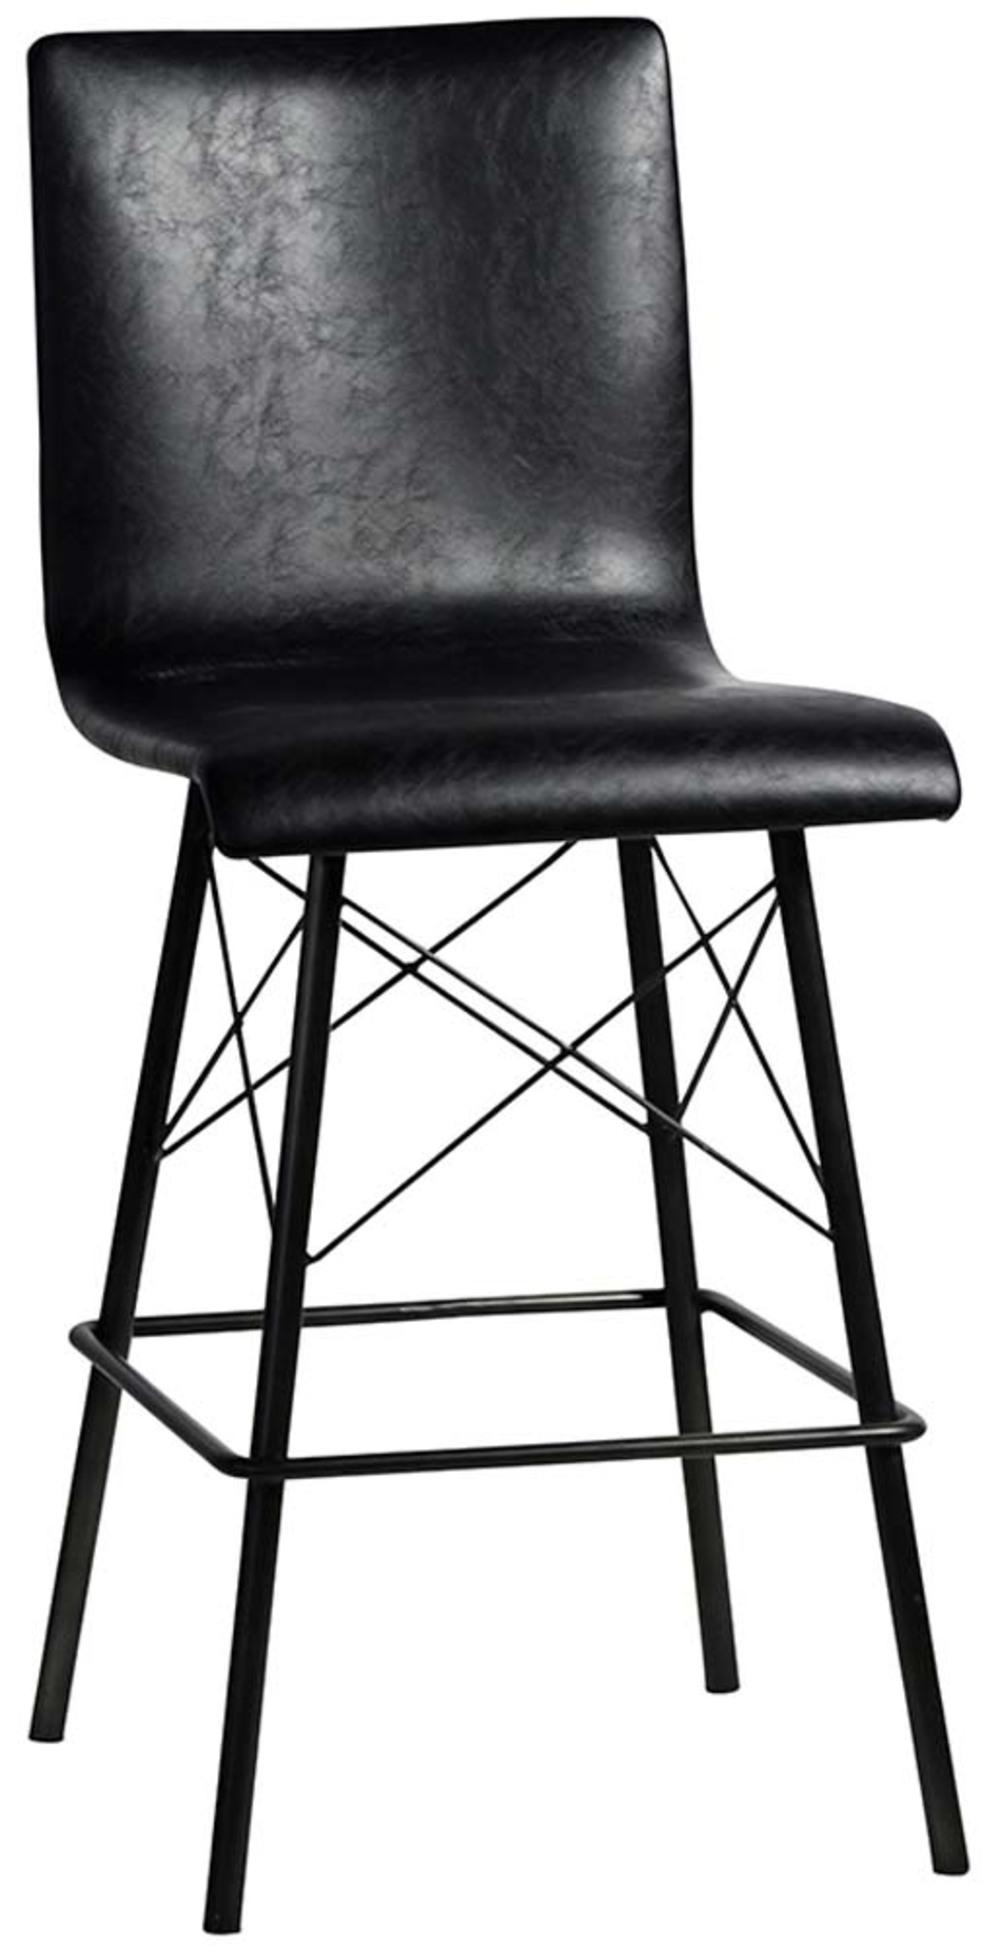 Dovetail Furniture - Messina Counter Stool